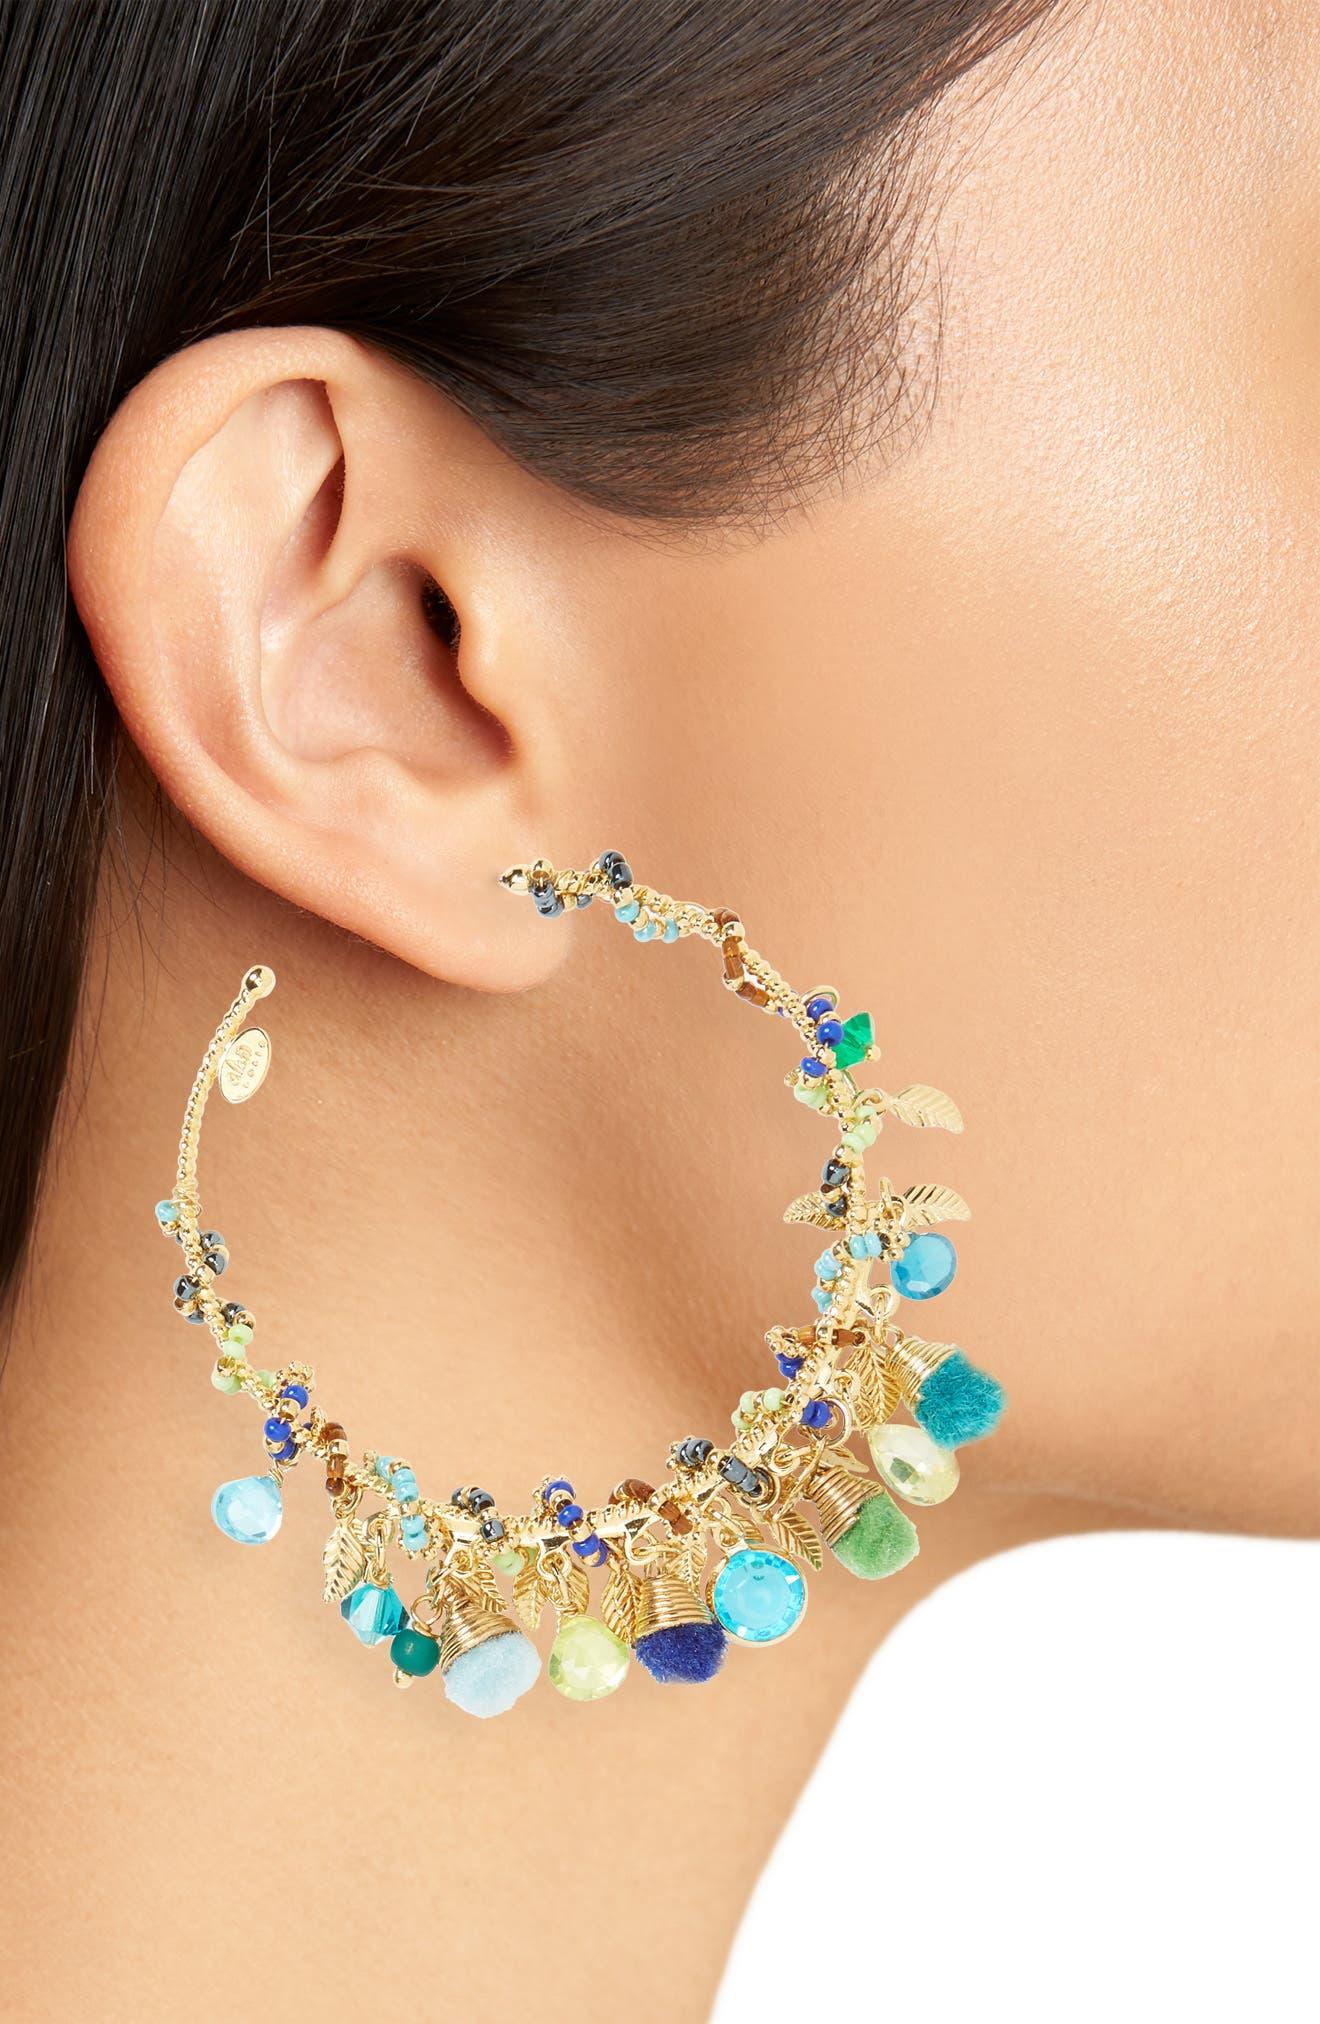 Folia Hoop Earrings,                             Alternate thumbnail 2, color,                             Blue Green/ Gold